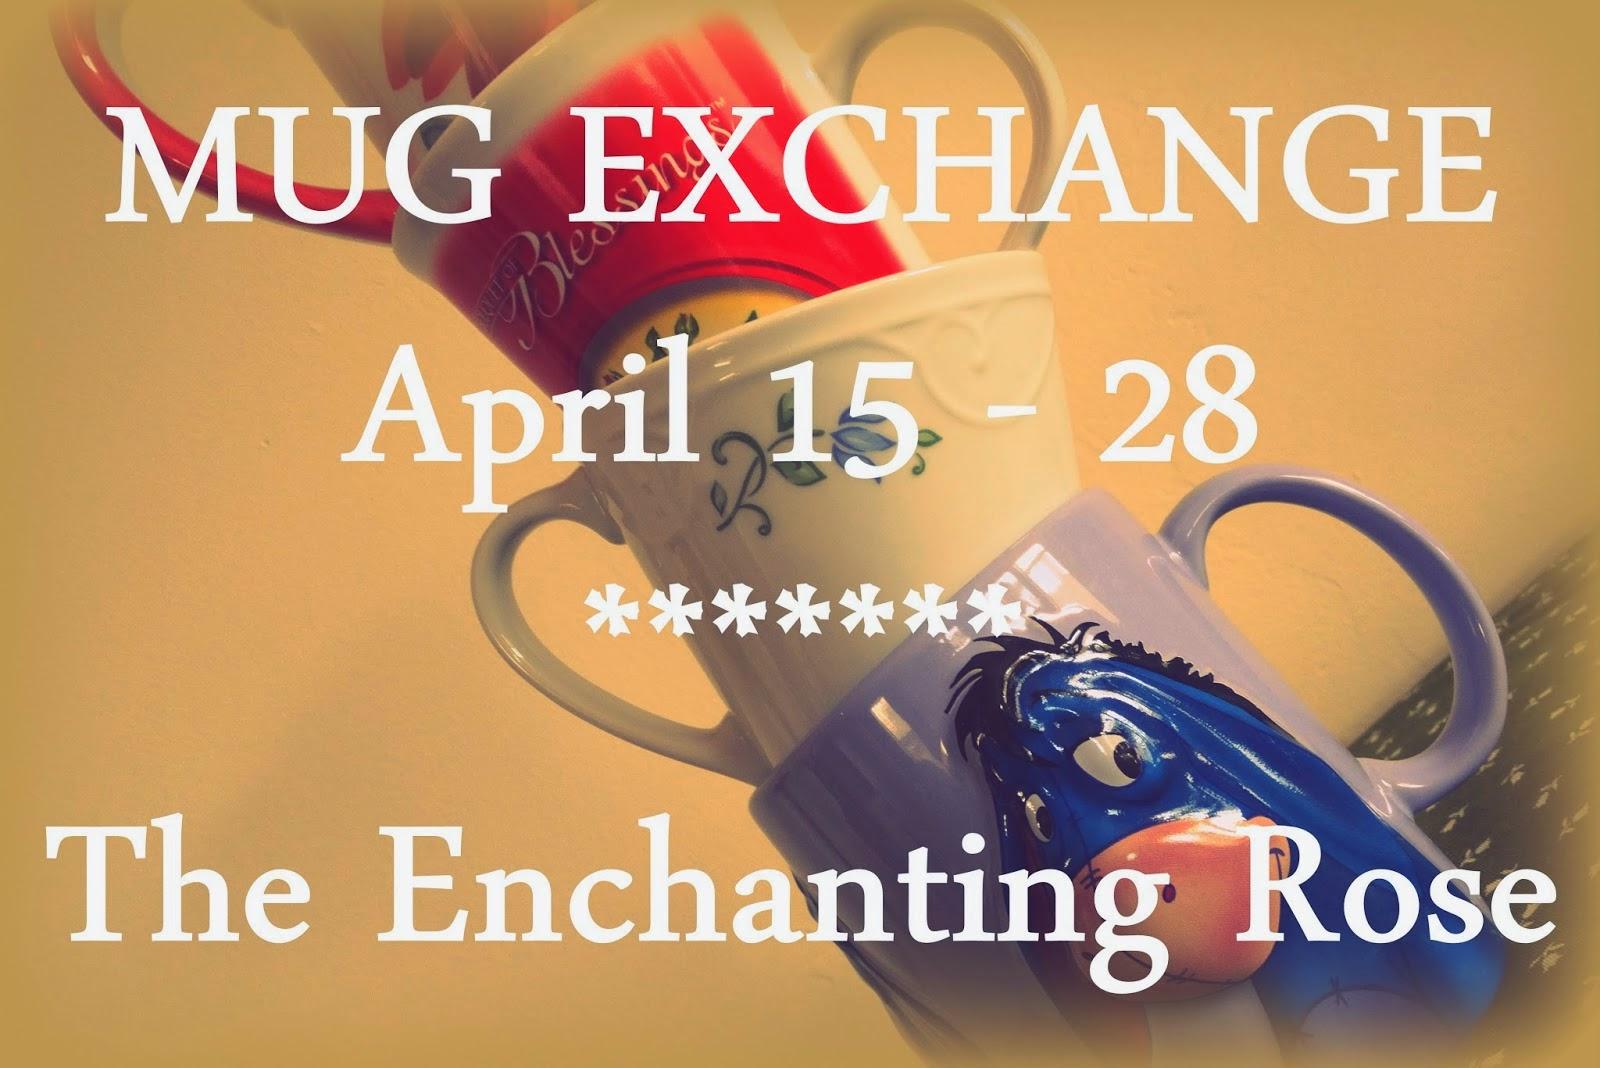 http://theenchantingrose.blogspot.com/2014/04/sign-up-for-mug-exchange.html